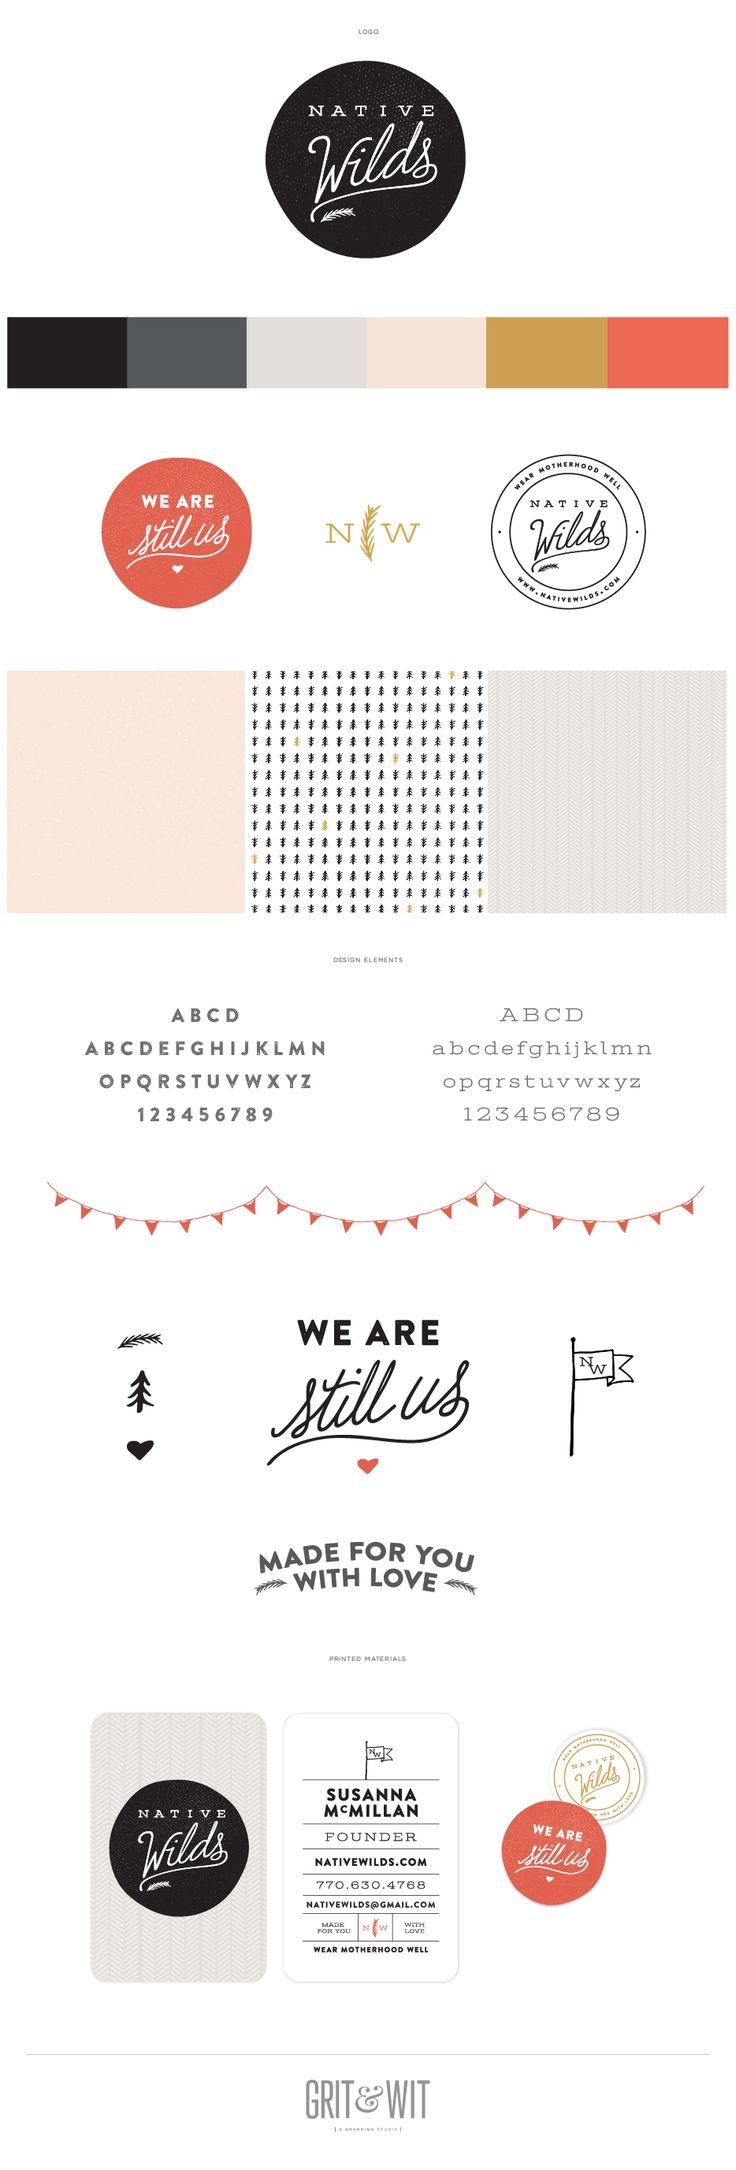 New Brand Reveal / Native Wilds/ Grit & Wit #gritandwit #brand #design #nativewilds #motherhood #illustration